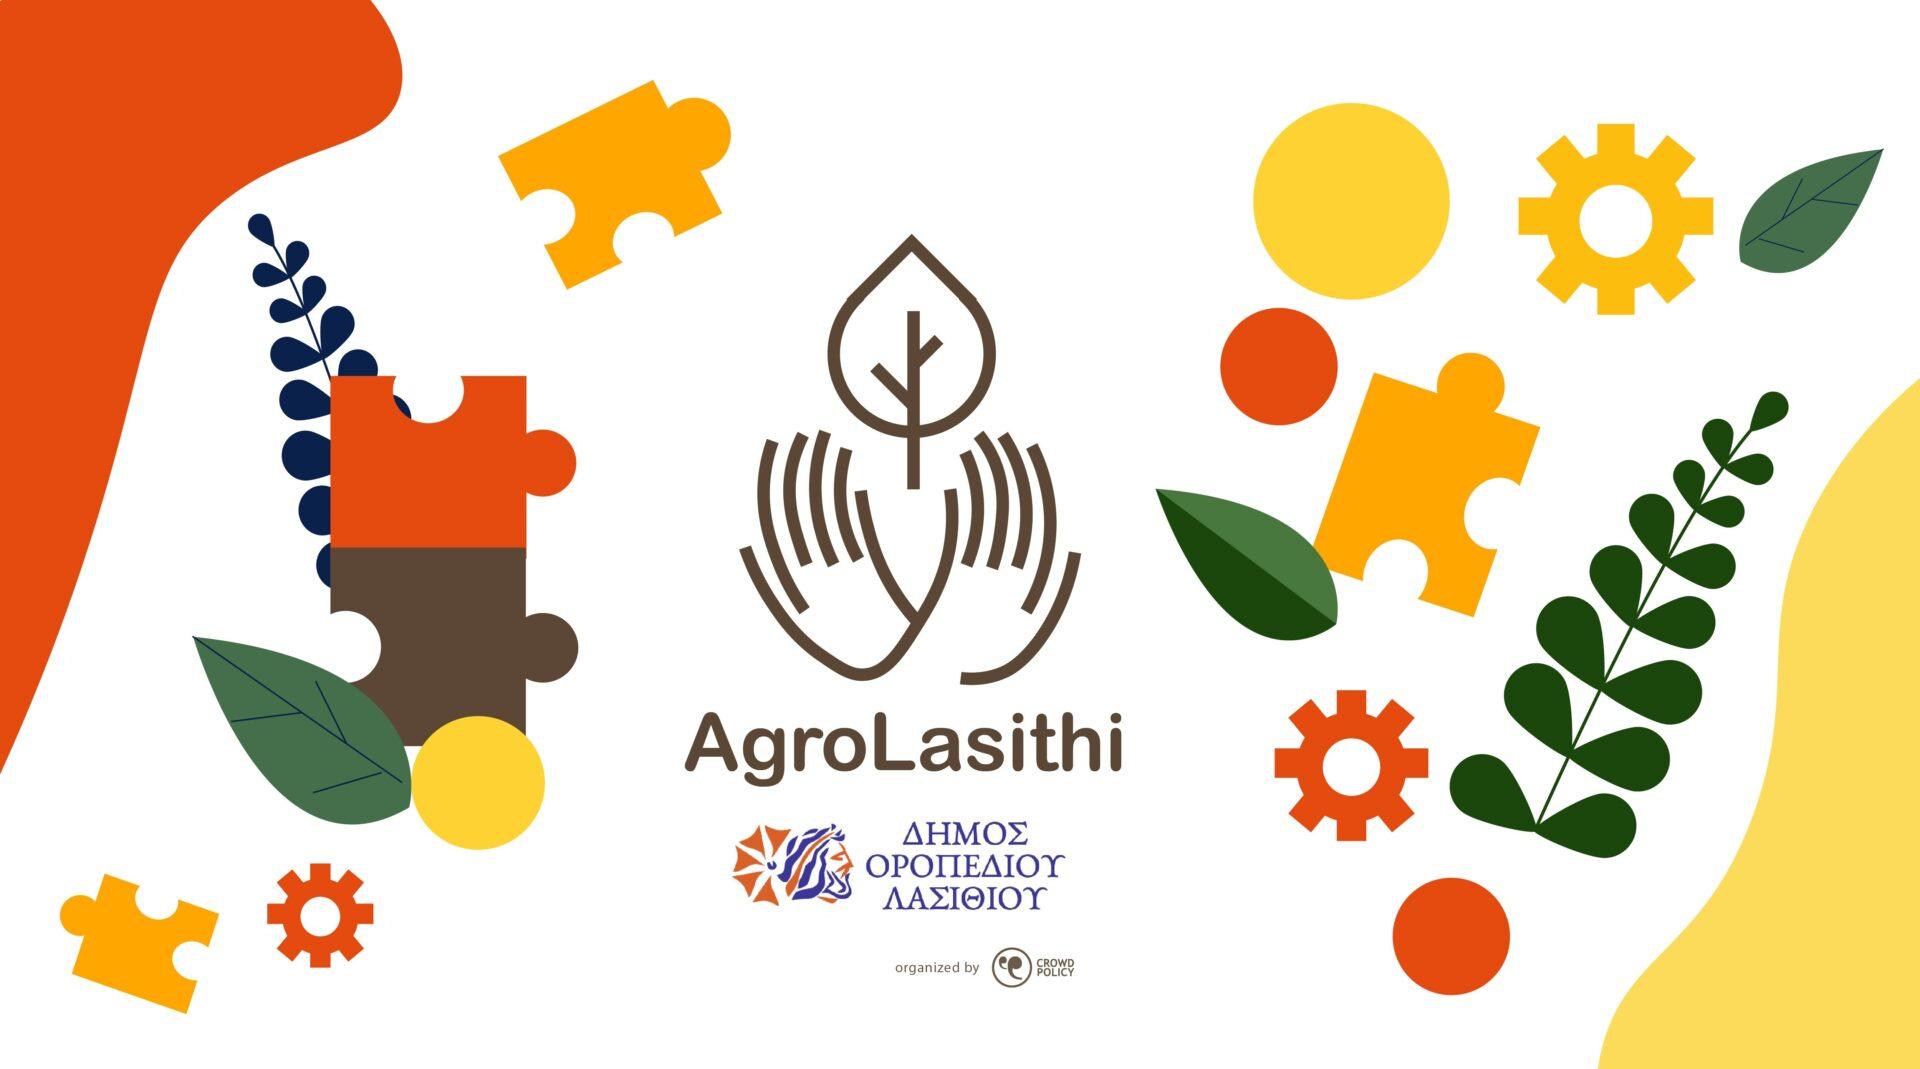 agrolasithi.gr